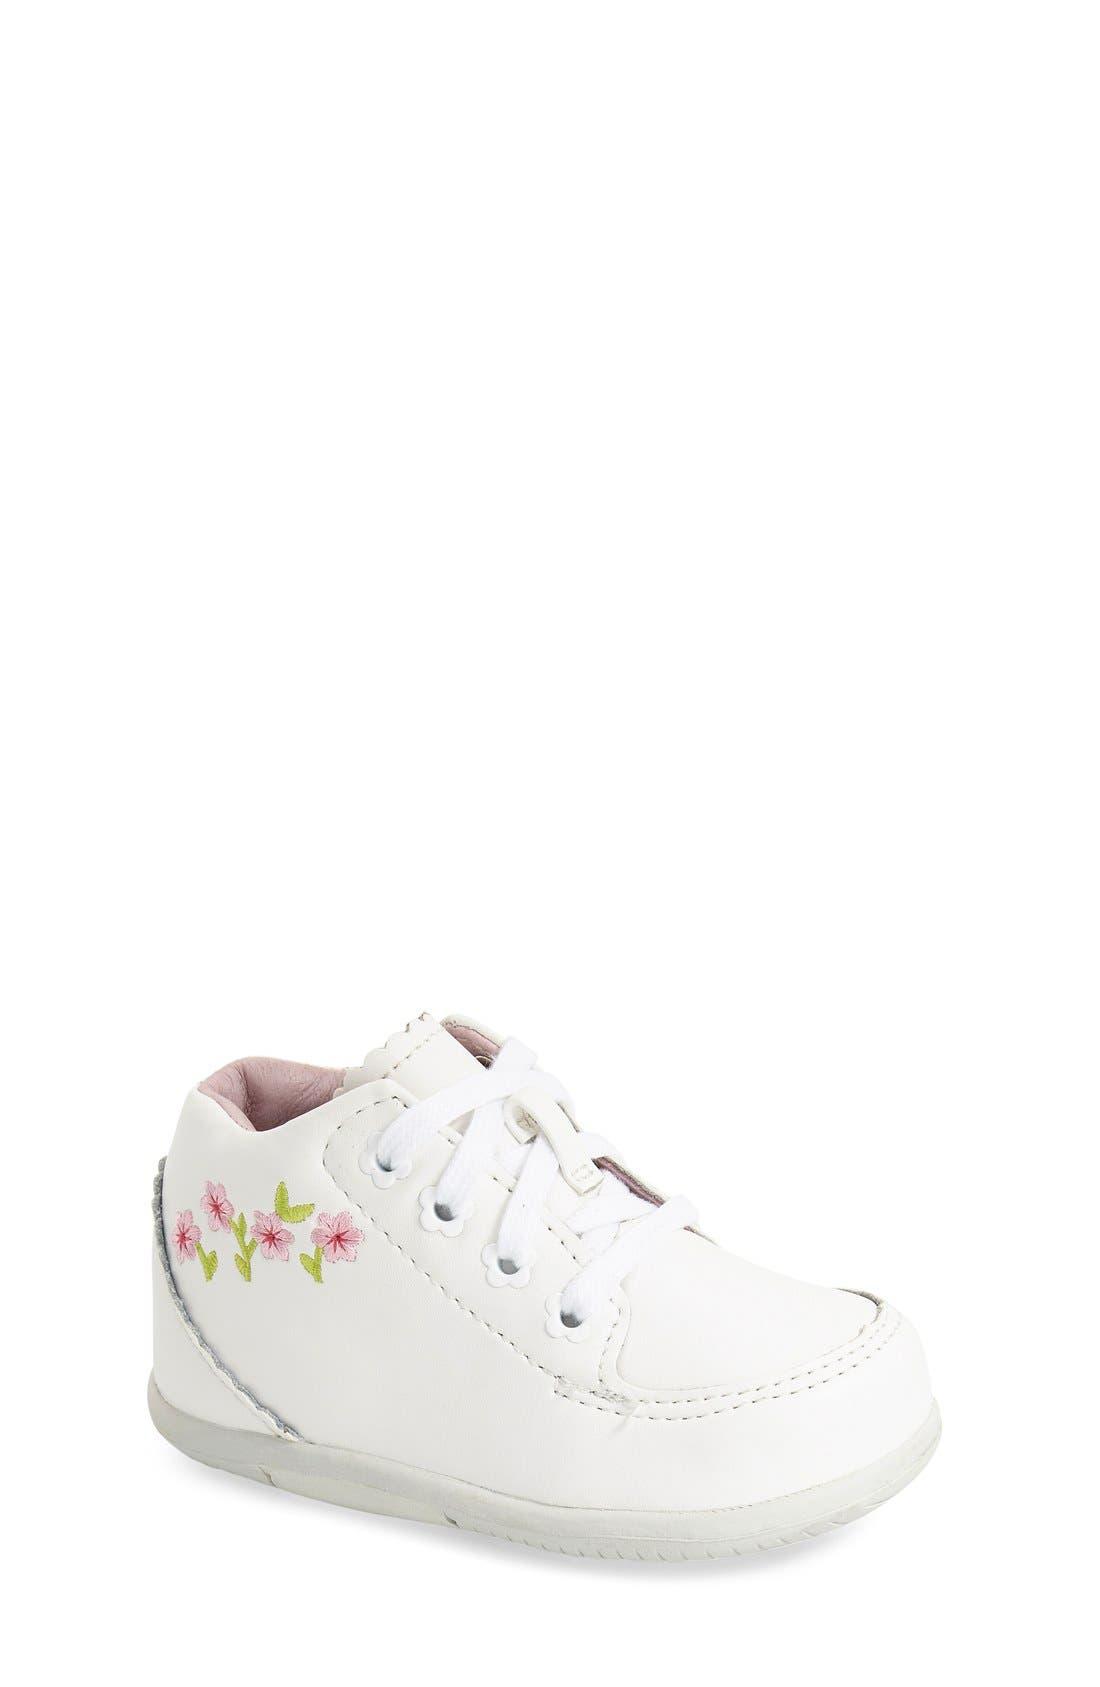 'Emilia' Leather Boot,                             Main thumbnail 1, color,                             WHITE